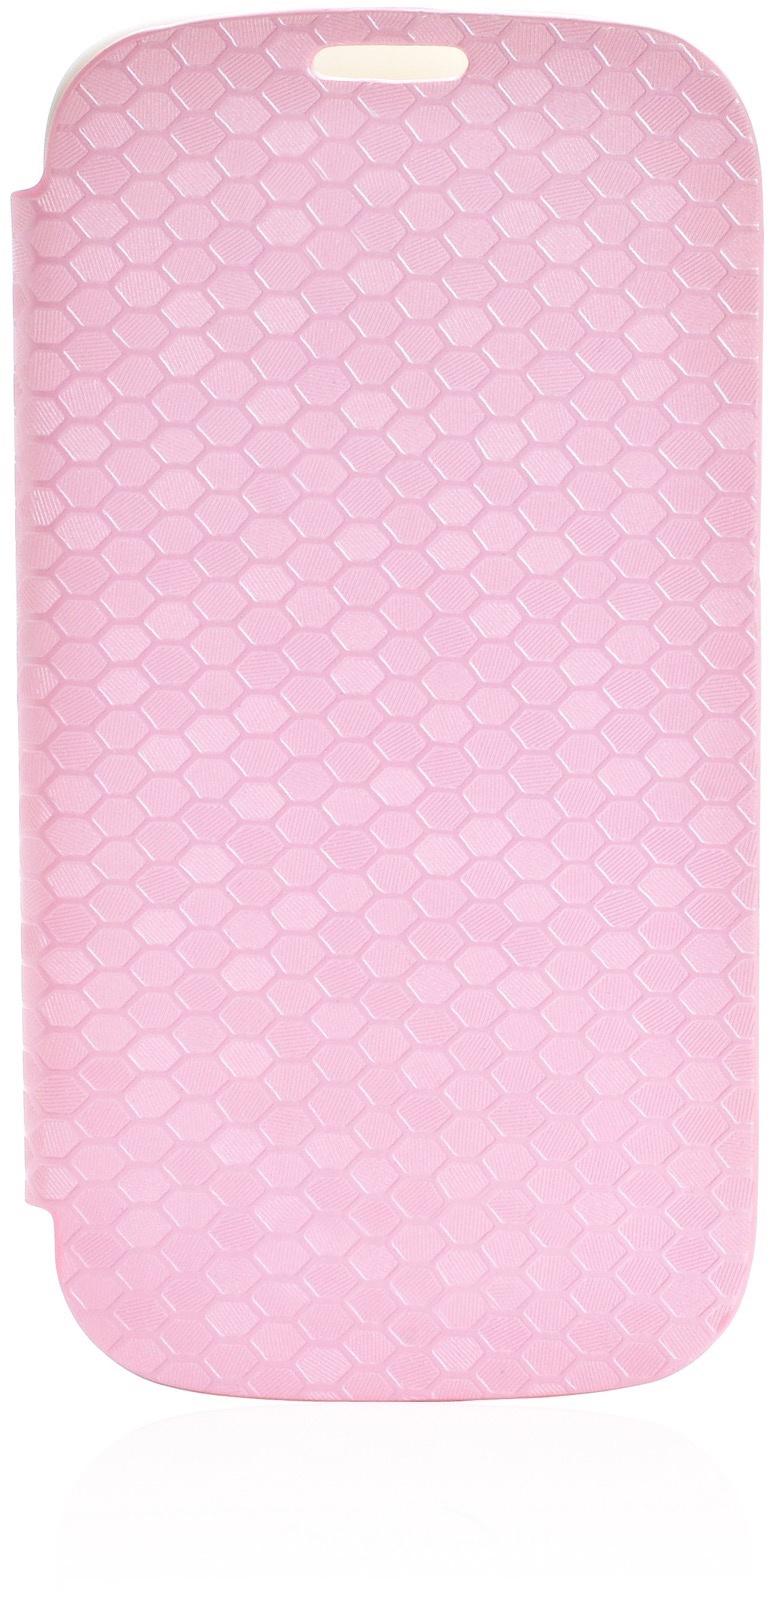 Чехол Gurdini Flip Case соты 380031 для Samsung Galaxy S3,380031, розовый